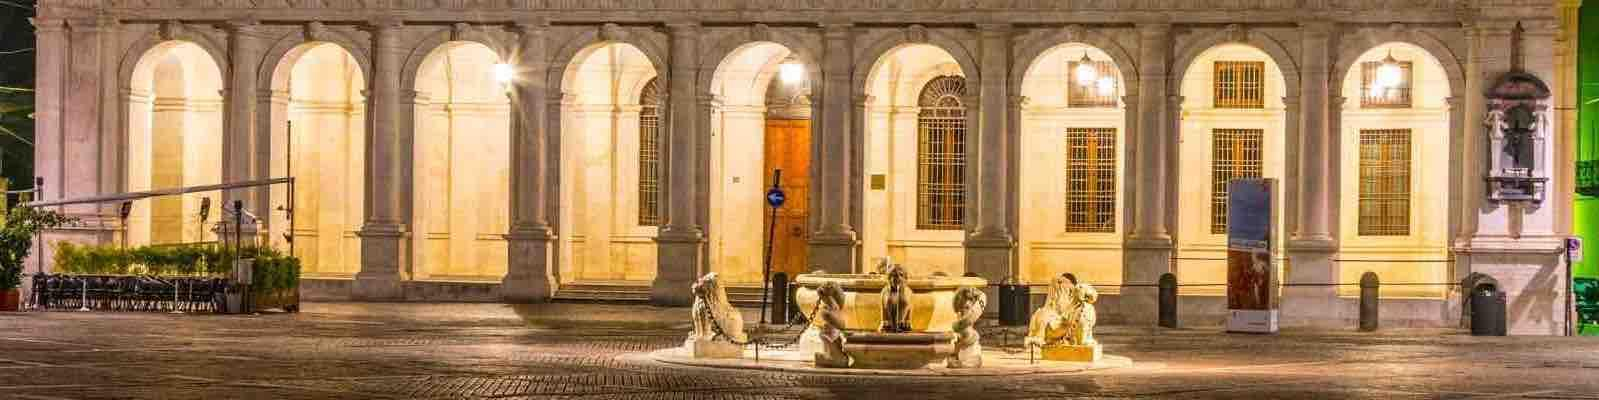 Biblioteca Civica Angelo Mai e Archivi storici comunali